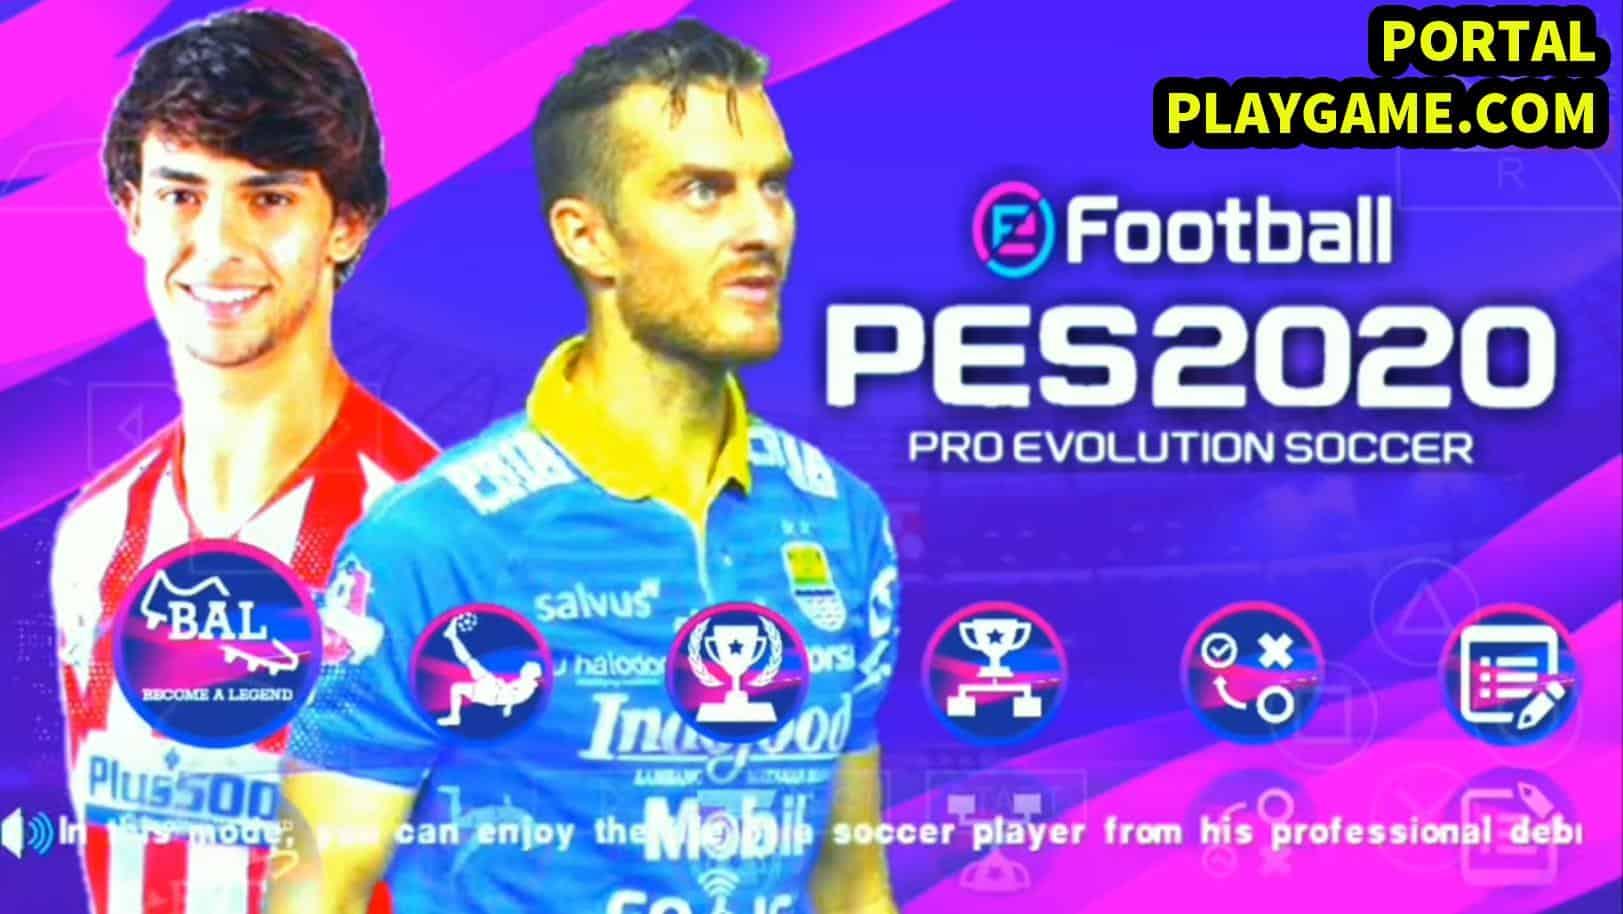 Yang kemarin tanya soal download game pes  PES 2020 PPSSPP SLI Shopee Liga 1 Indonesia  All Eropa Transfer 2019/2020